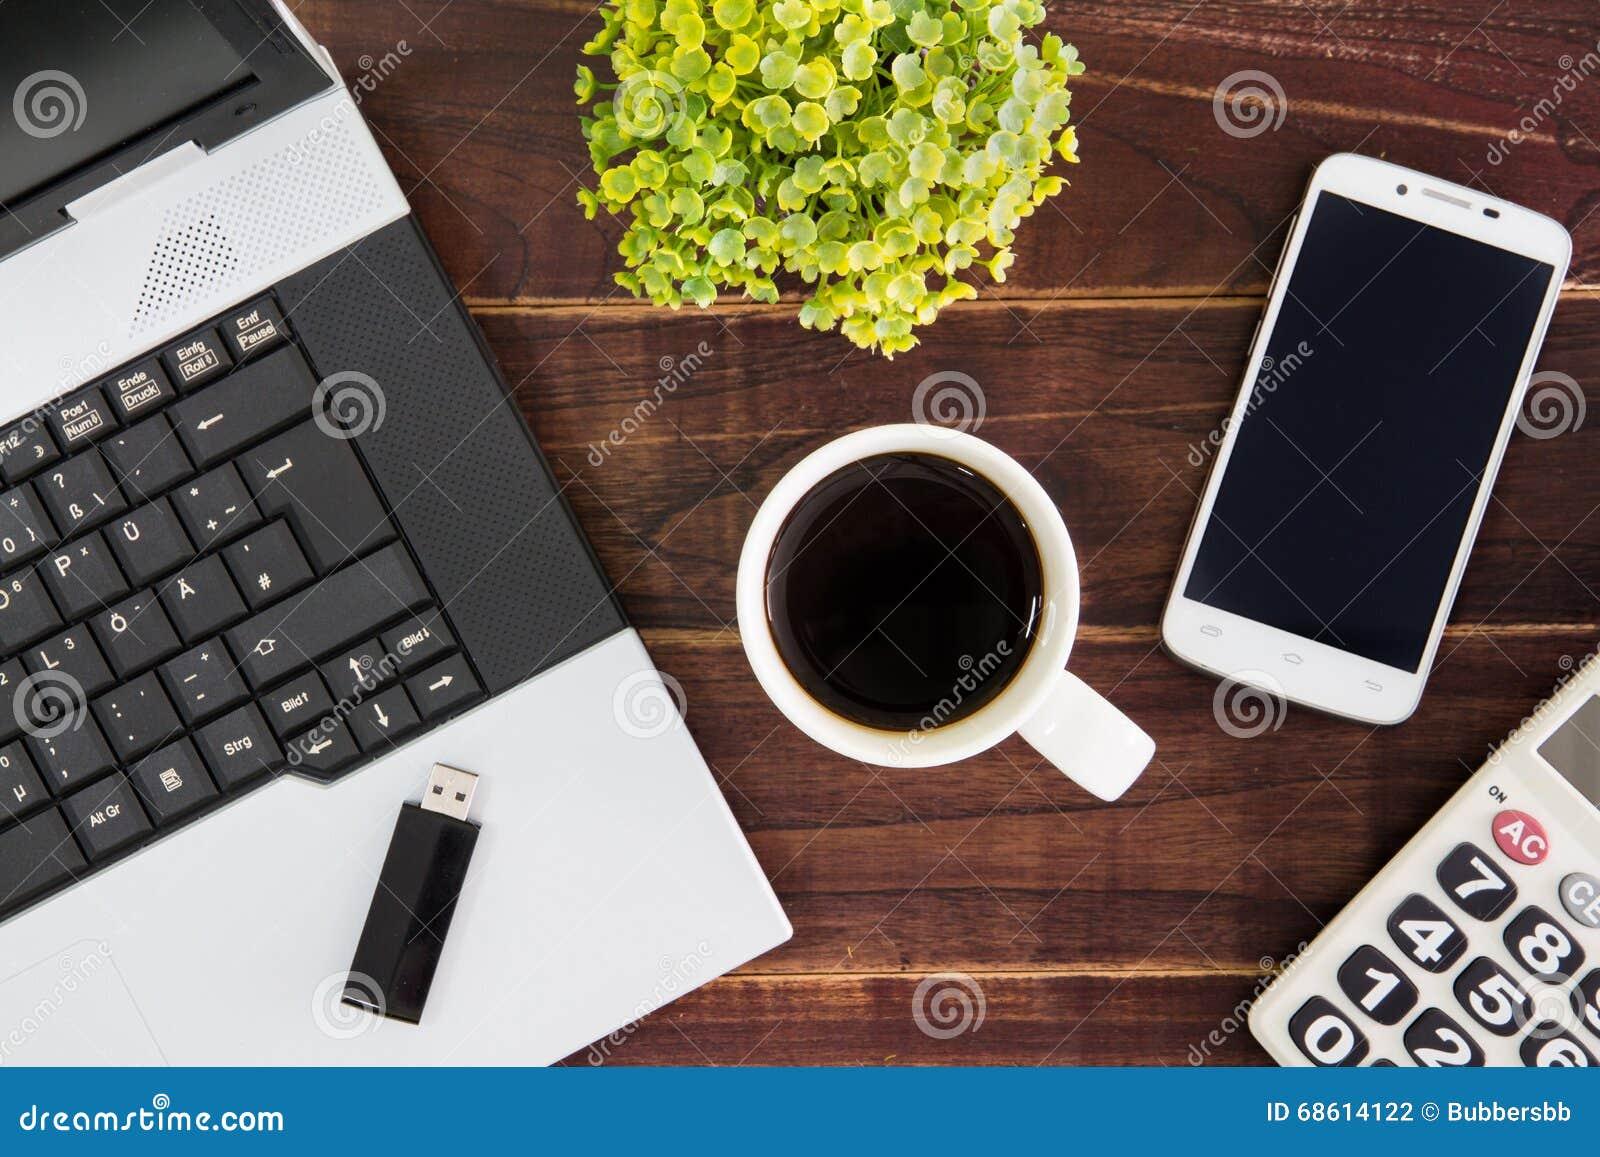 Notebook computer on the desk.Calculators,USB flash drive stick,coffee cup,smartphone